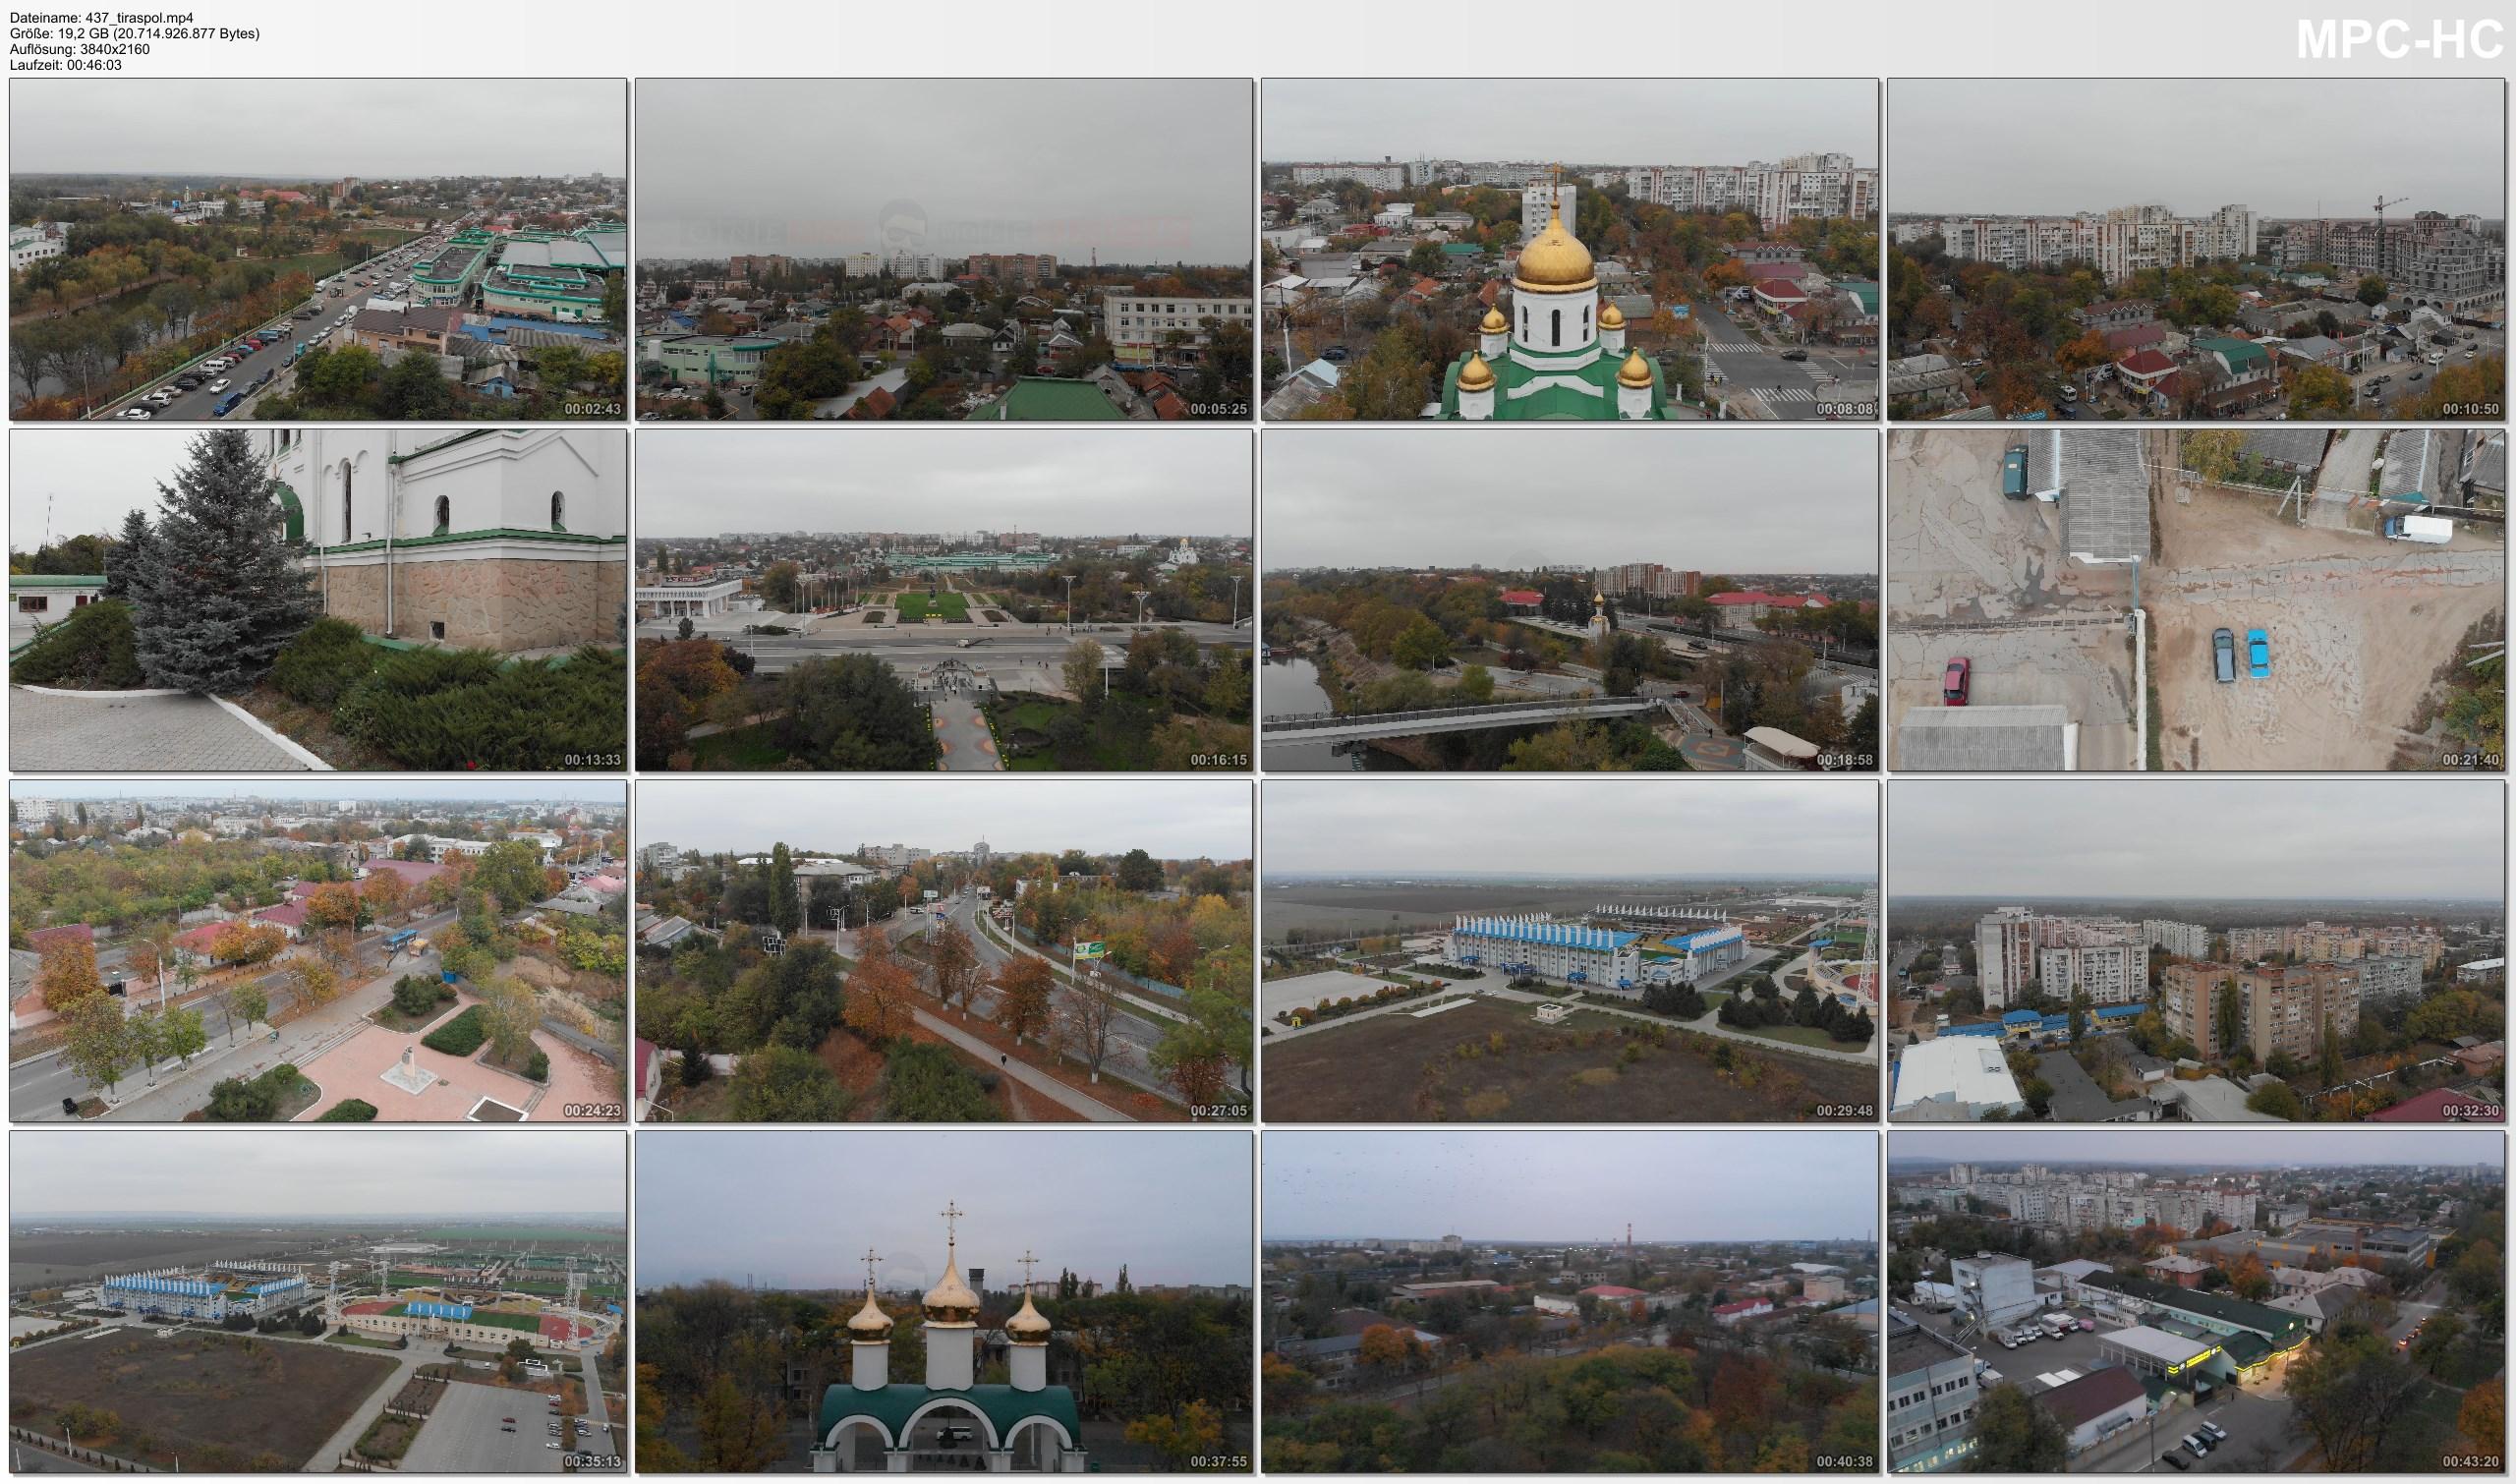 Drone Pictures from Video 【4K】Drone RAW Footage | TRANSNISTRIA 2019 ..:: Tiraspol Transdniestria Moldova | UltraHD Stock Video